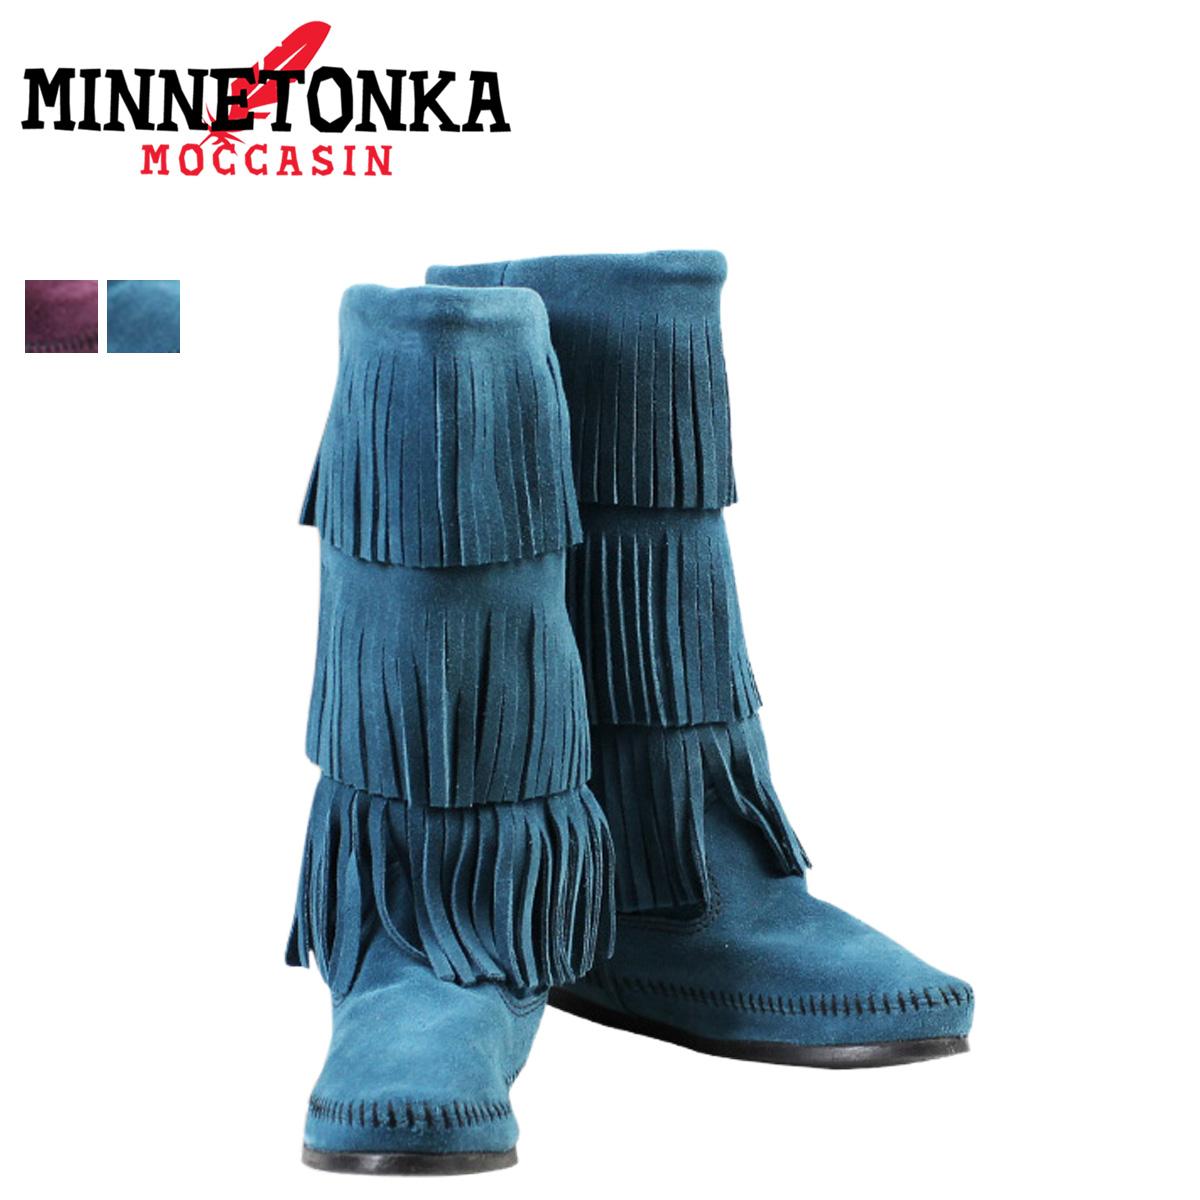 Minnetonka Calf Hi 3-Layer Fringe Boot R1q9um